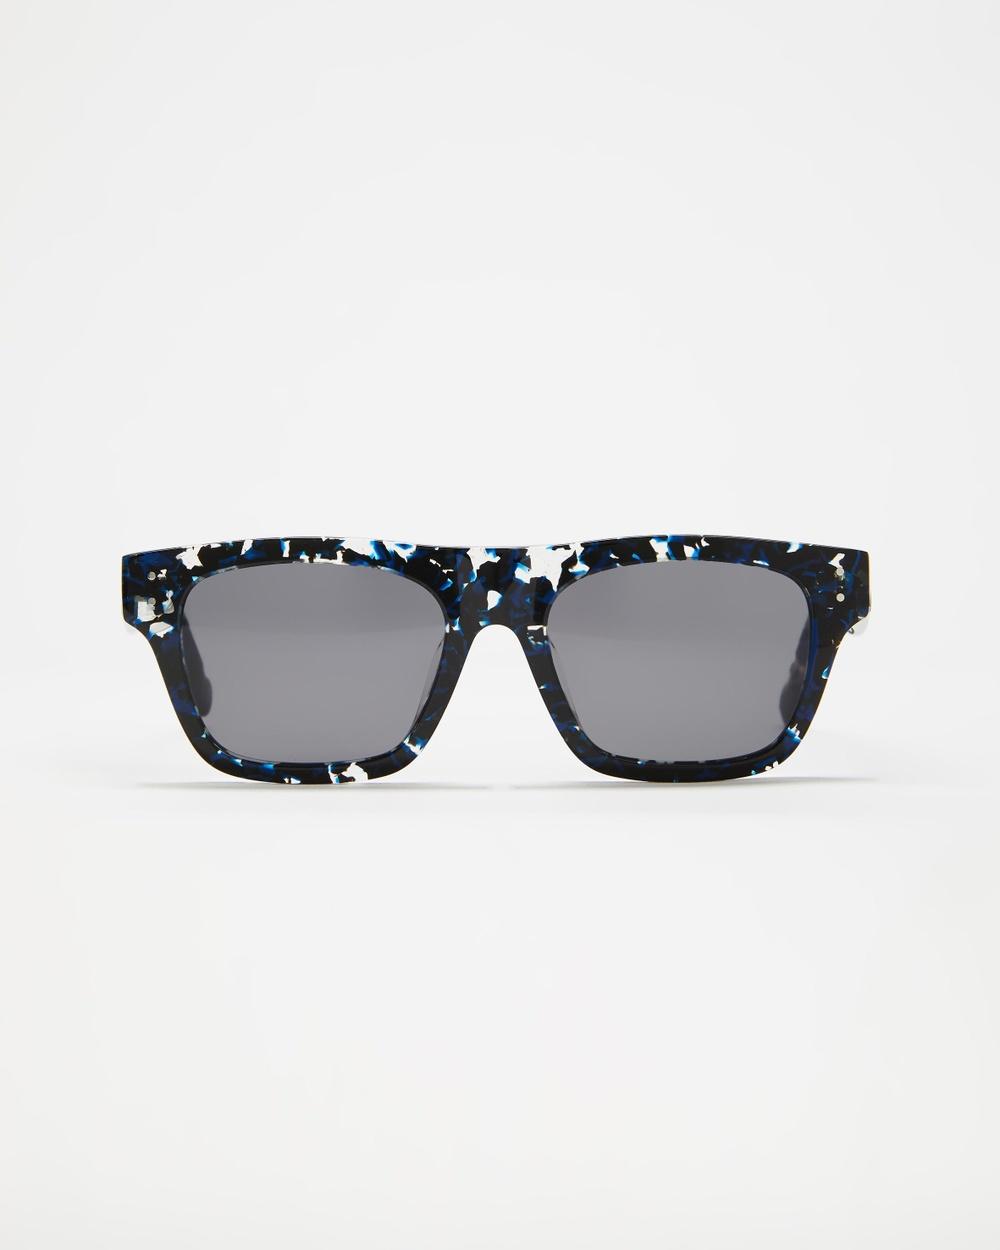 Le Specs Motif Sunglasses Black Navy Agate Australia